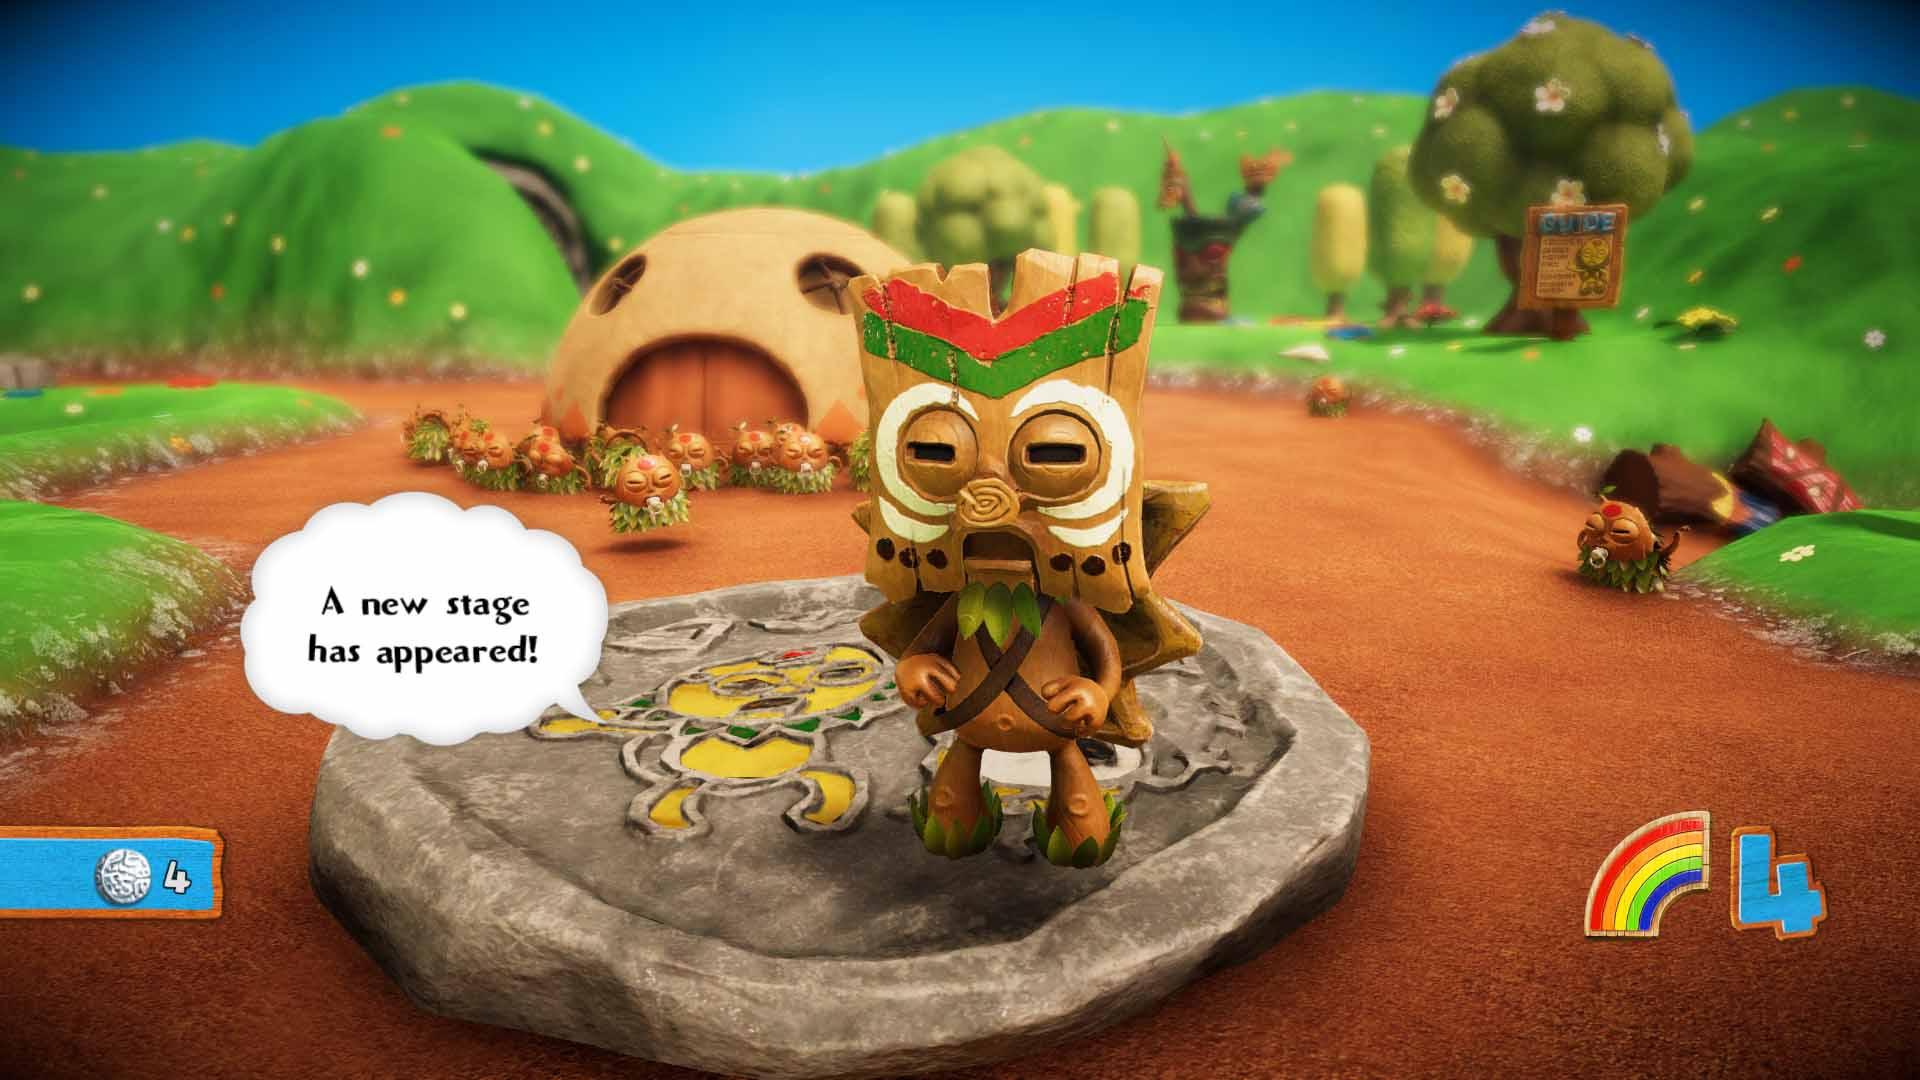 PixelJunk Monsters 2 Update - Spike Chunsoft